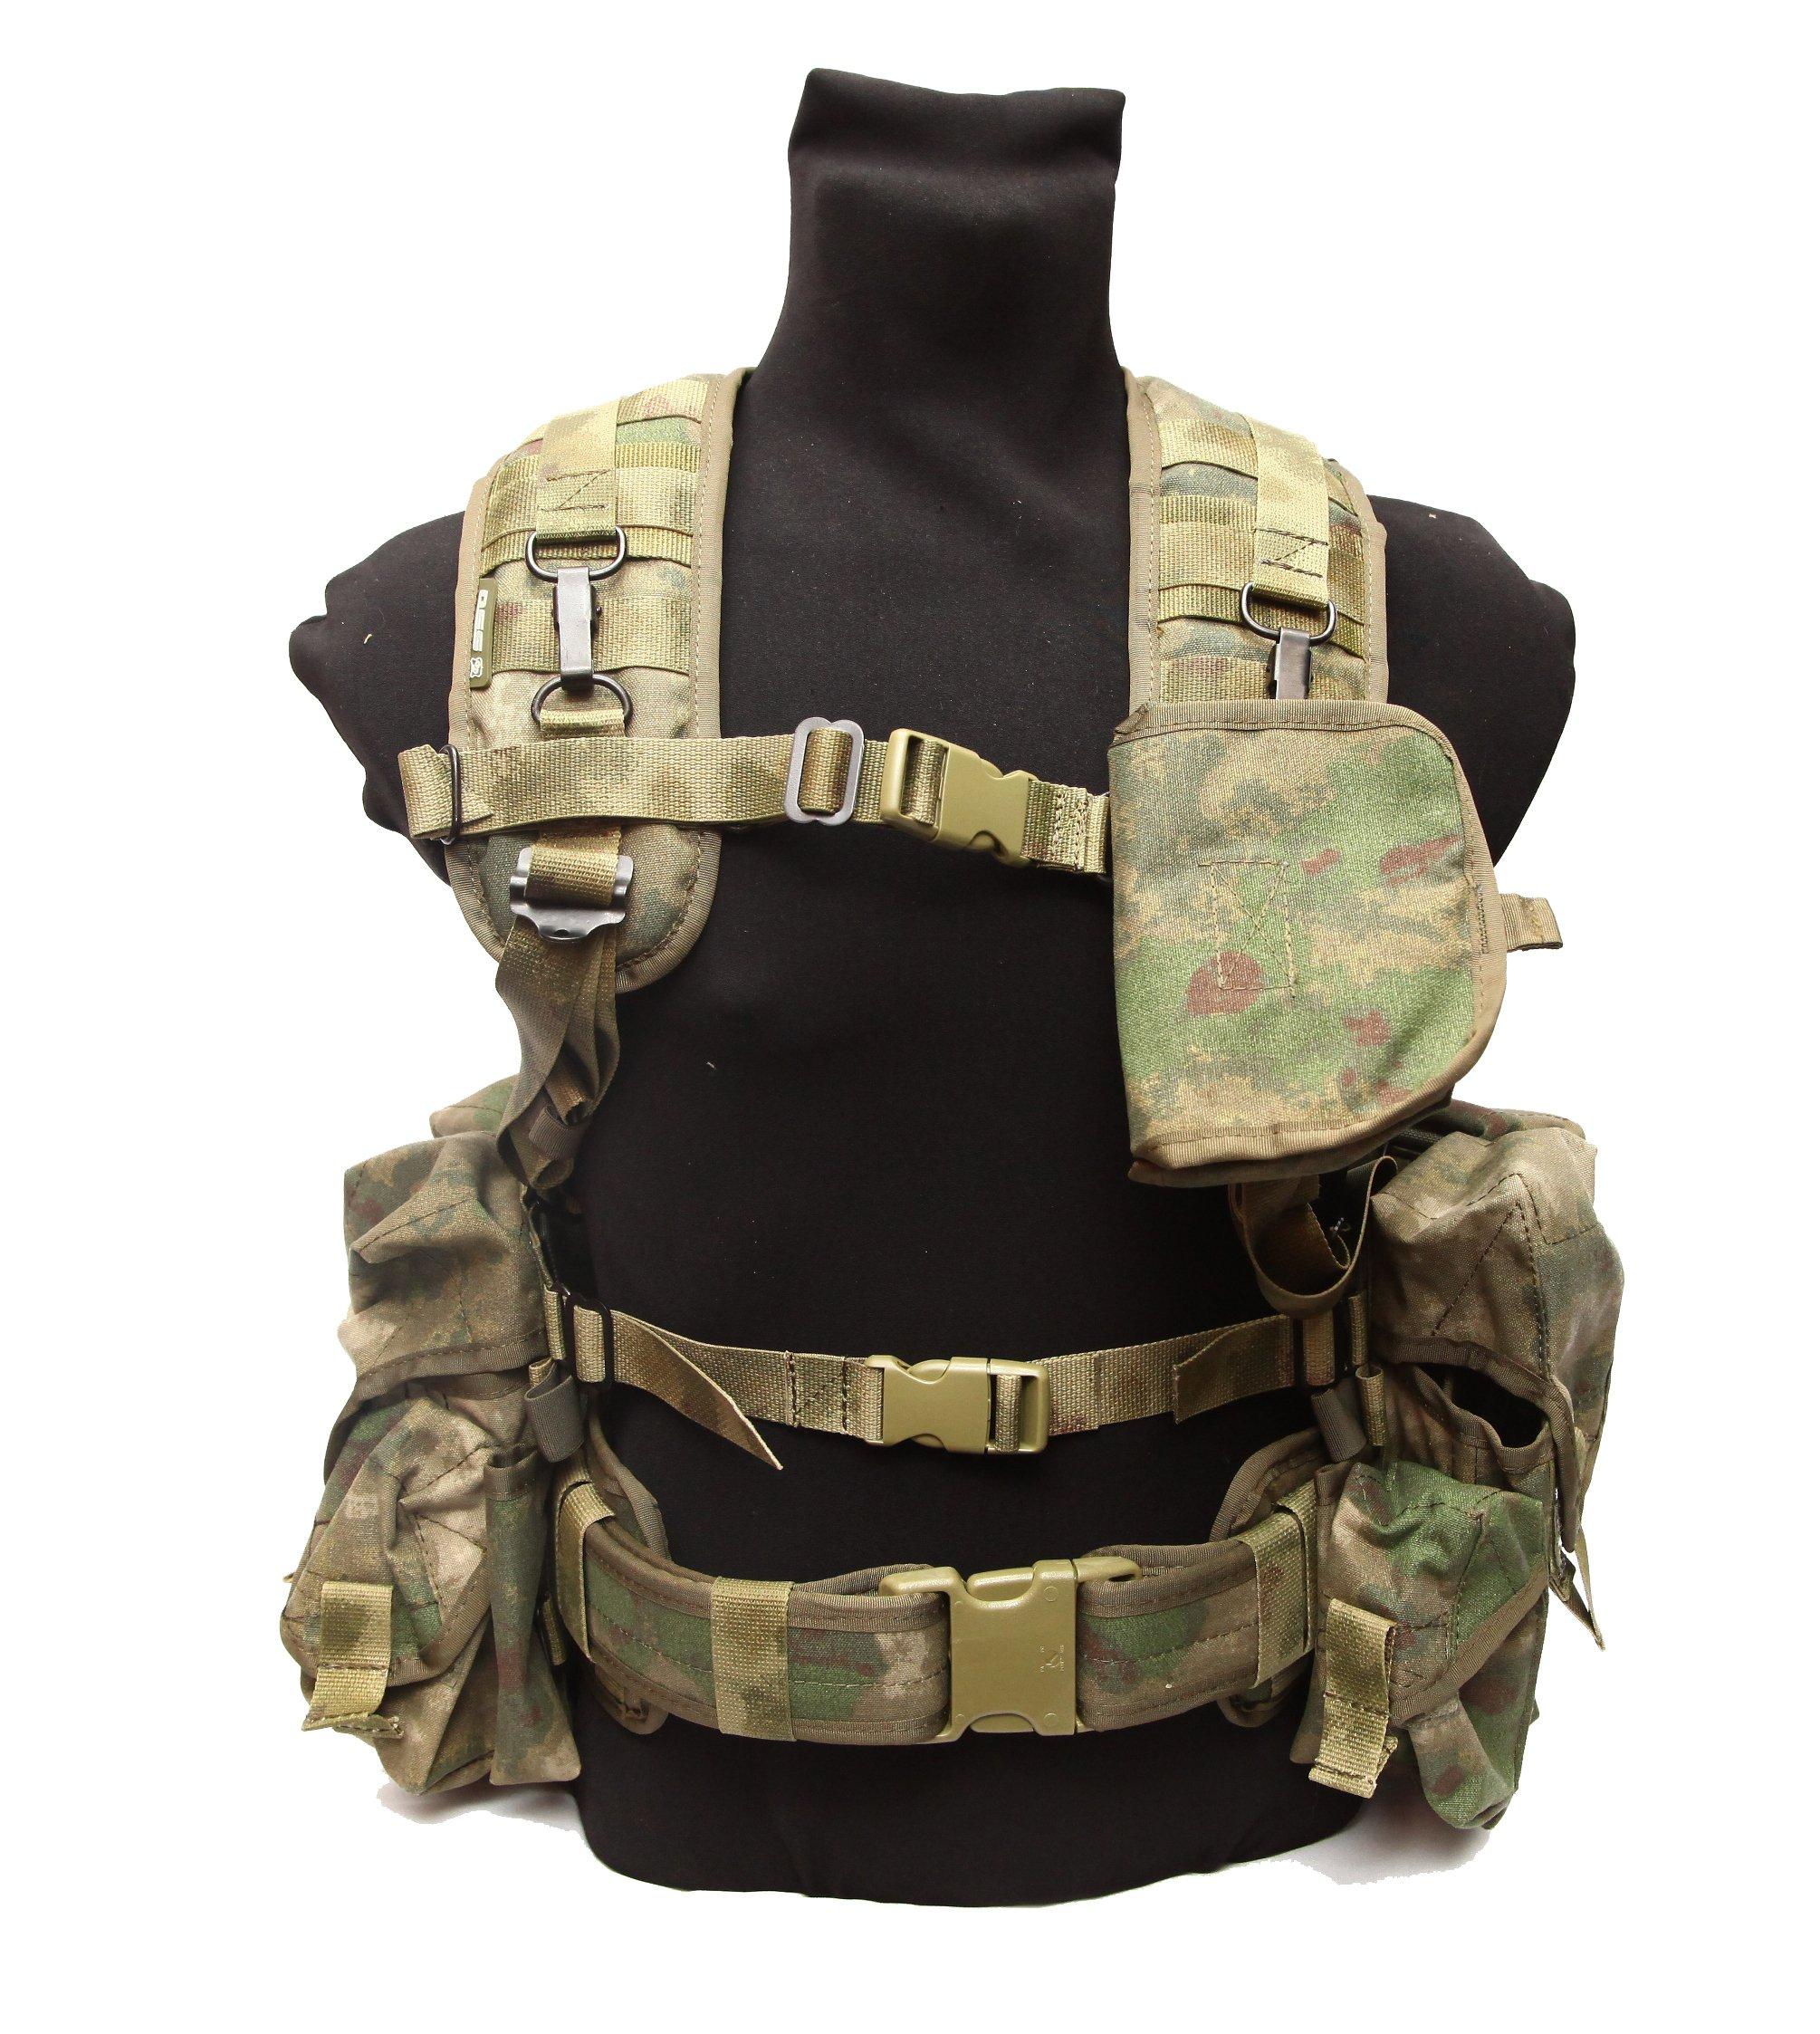 Russian army spetsnaz SPOSN SSO Smersh AK assault vest gear set A-tacs FG